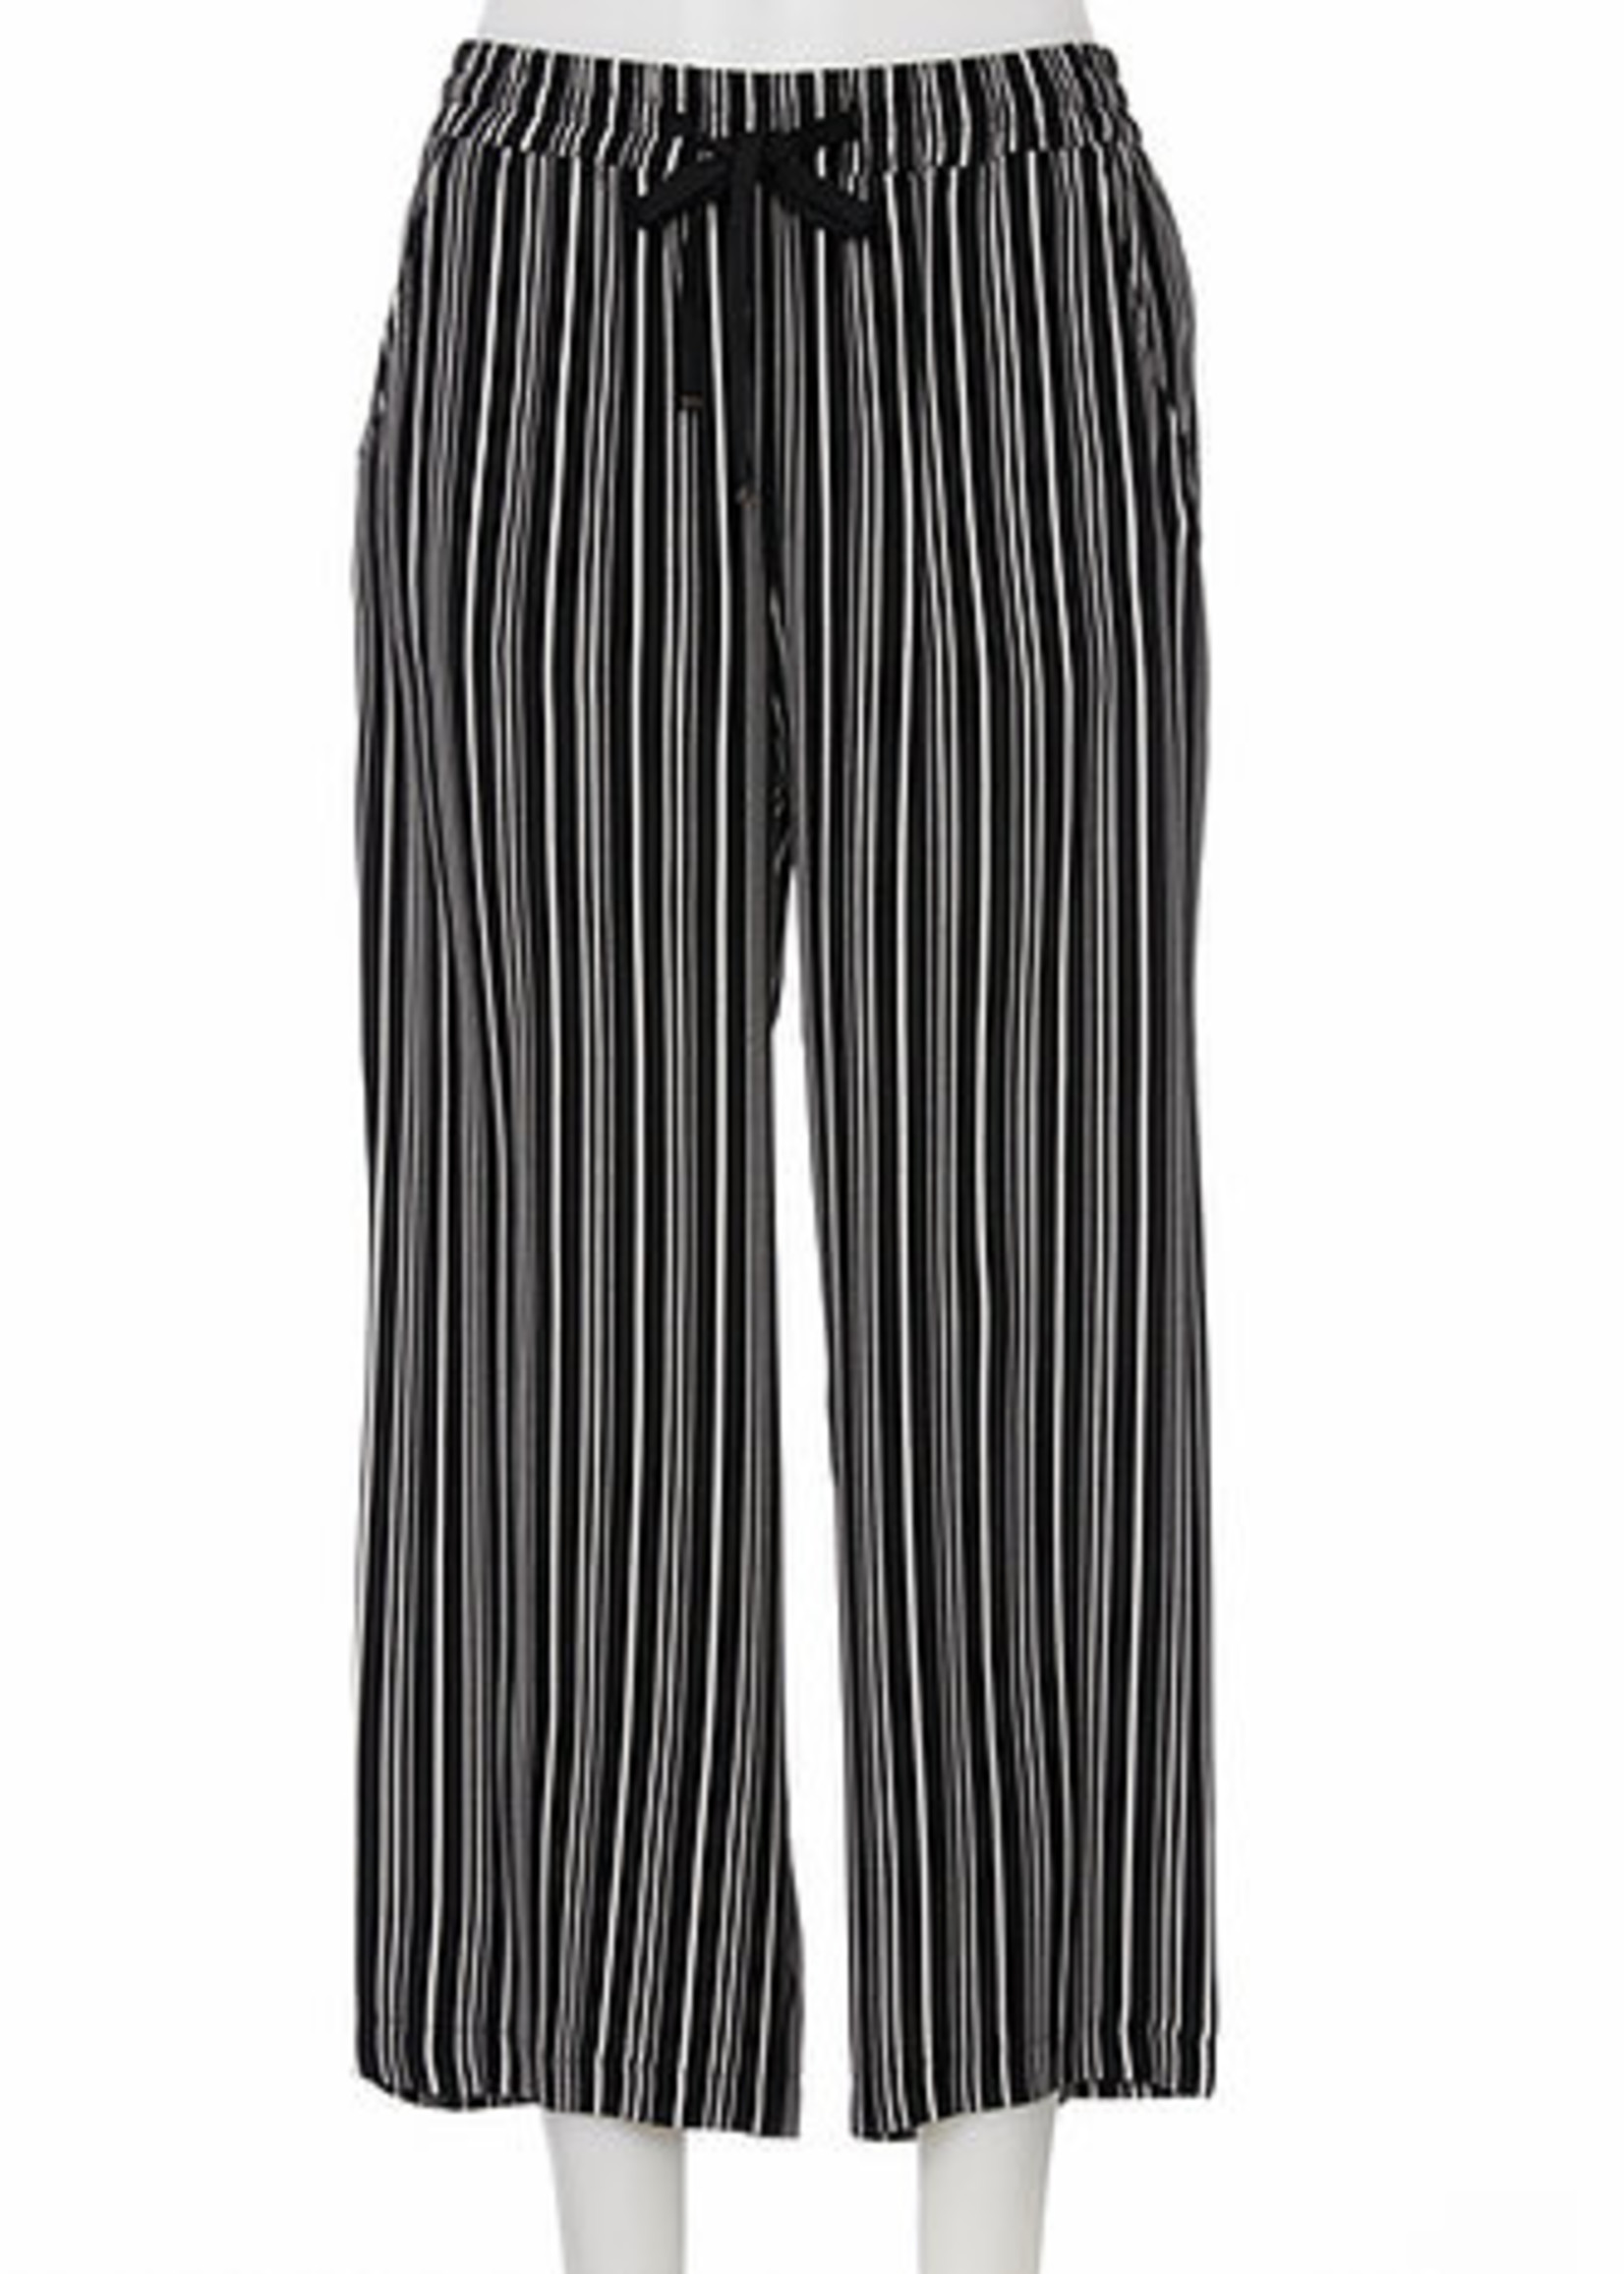 Stark Stark Bahia Black Stripe Pants